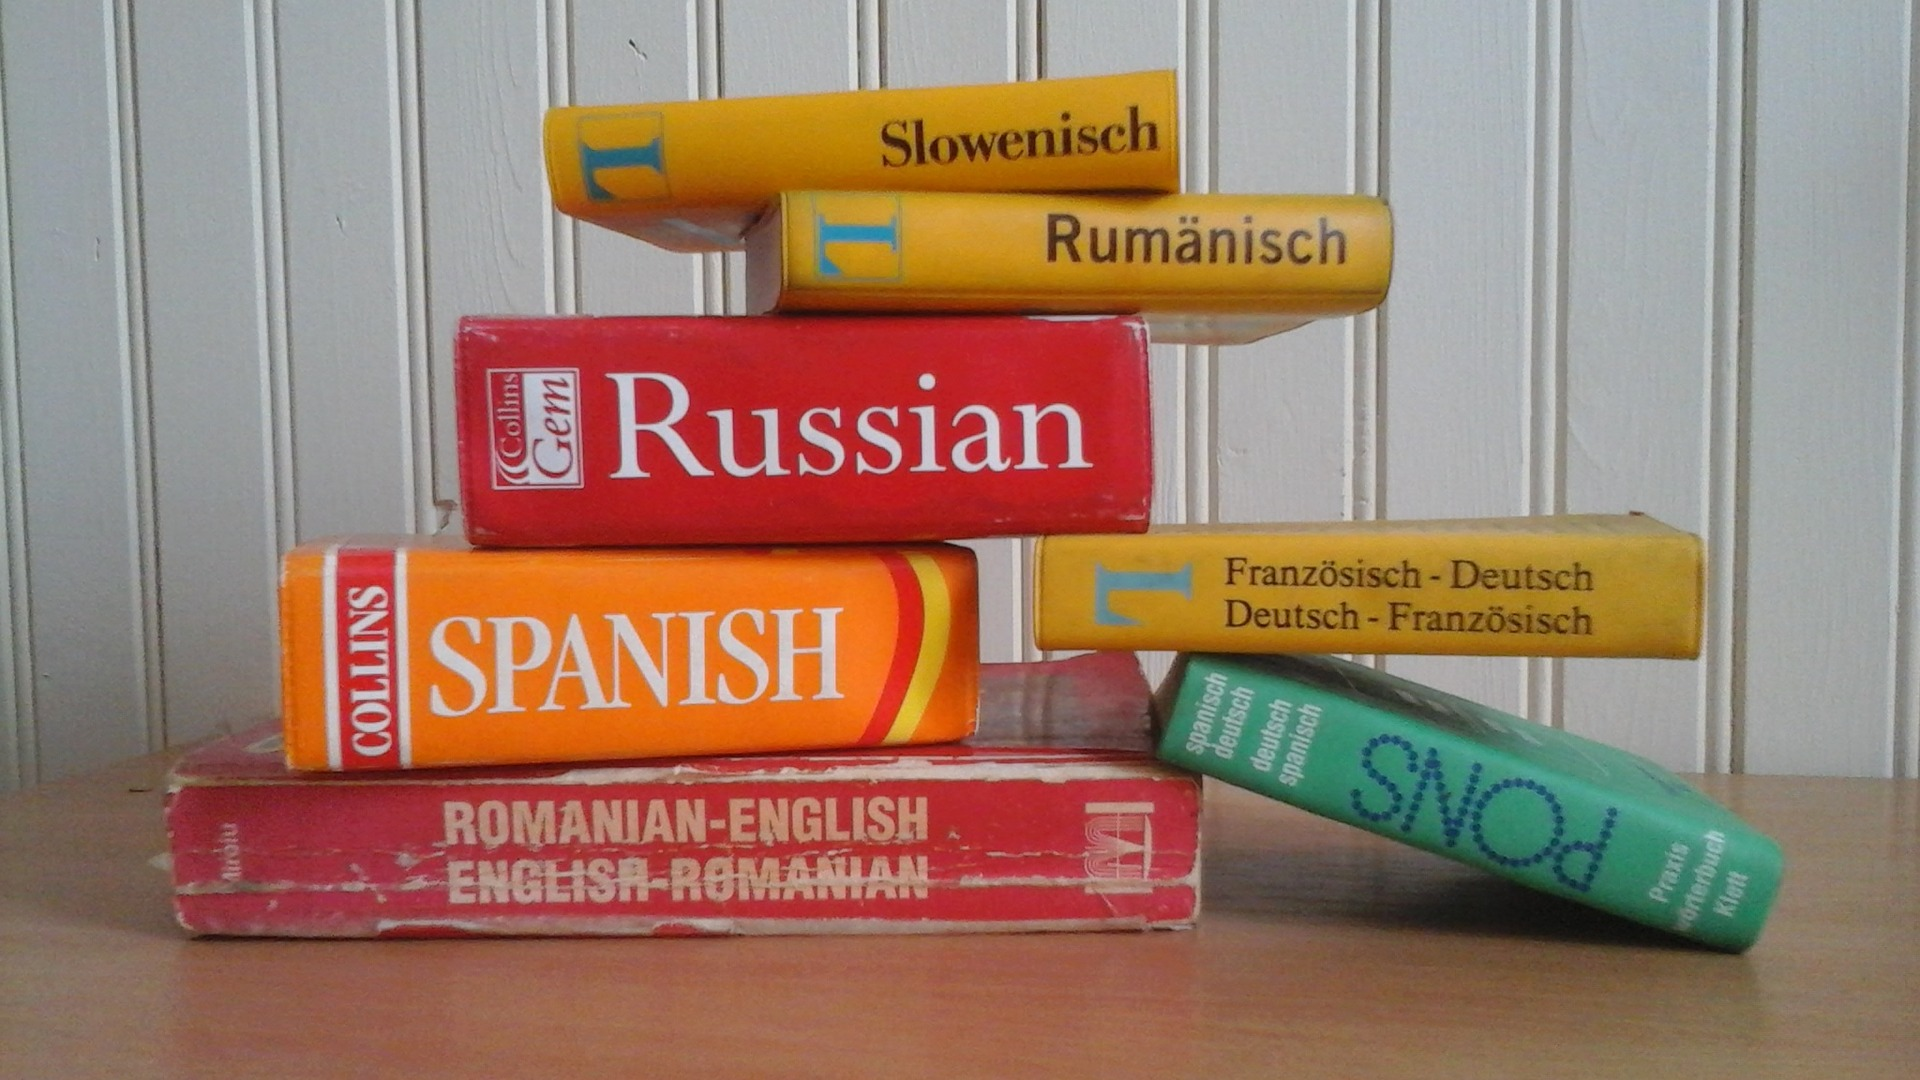 dictionary-2317654_1920.jpg